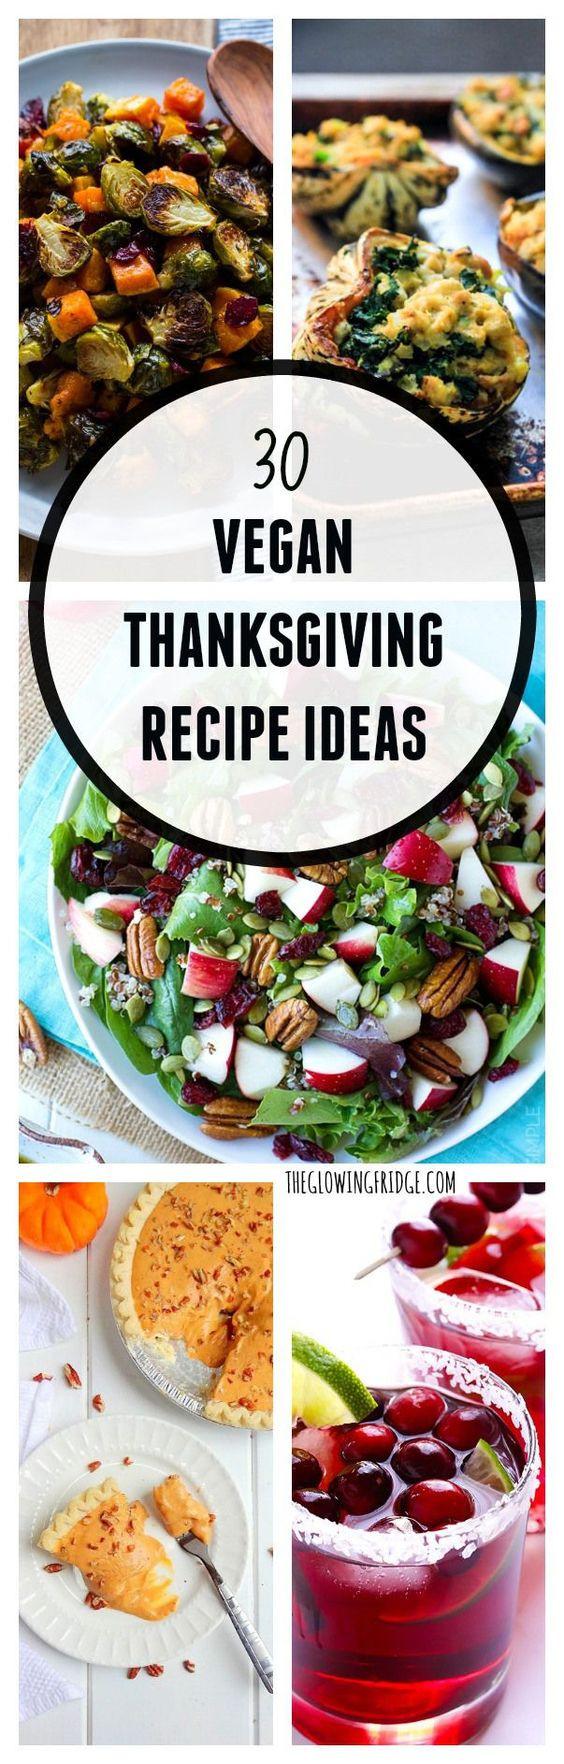 Vegetarian Thanksgiving Recipes Main Dish  30 Vegan Thanksgiving Recipe Ideas